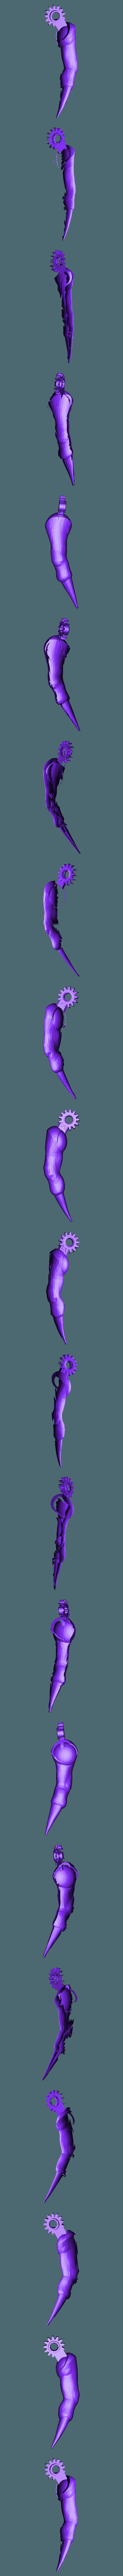 left thumb 2 print.stl Download free STL file GADGET the robotic Gremlin • 3D printing object, atarka3